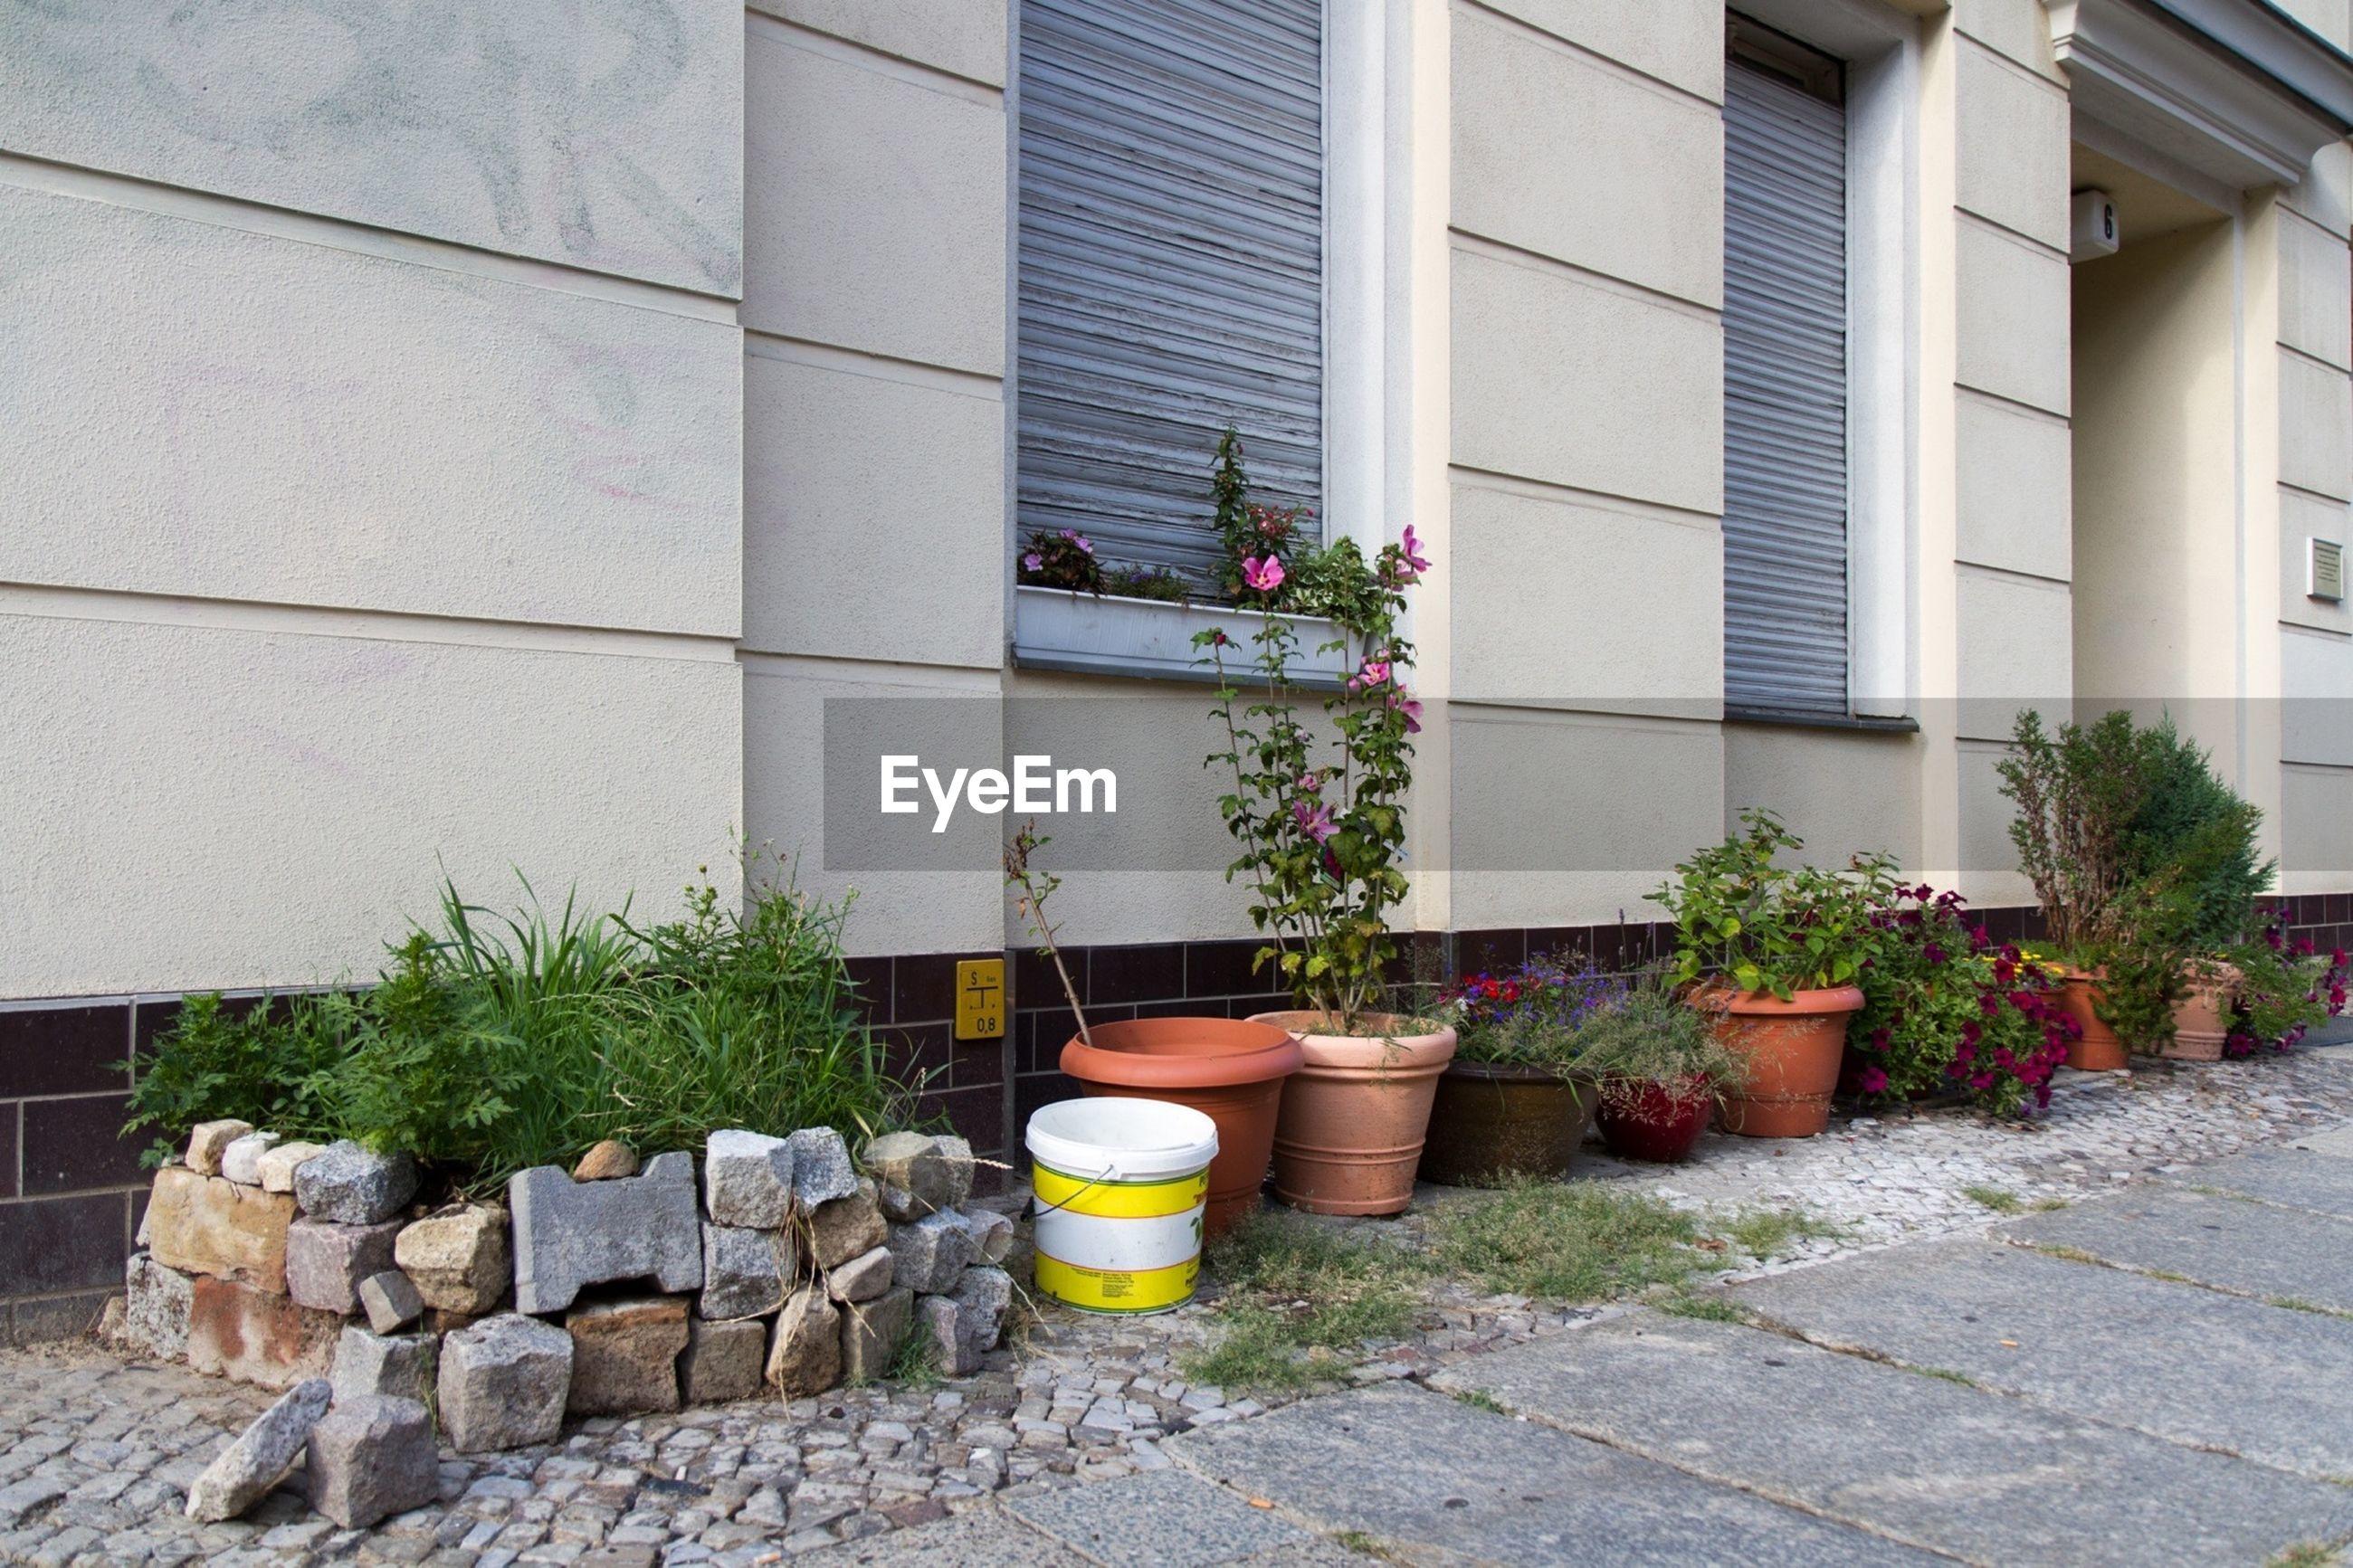 Row of potted plants on sidewalk